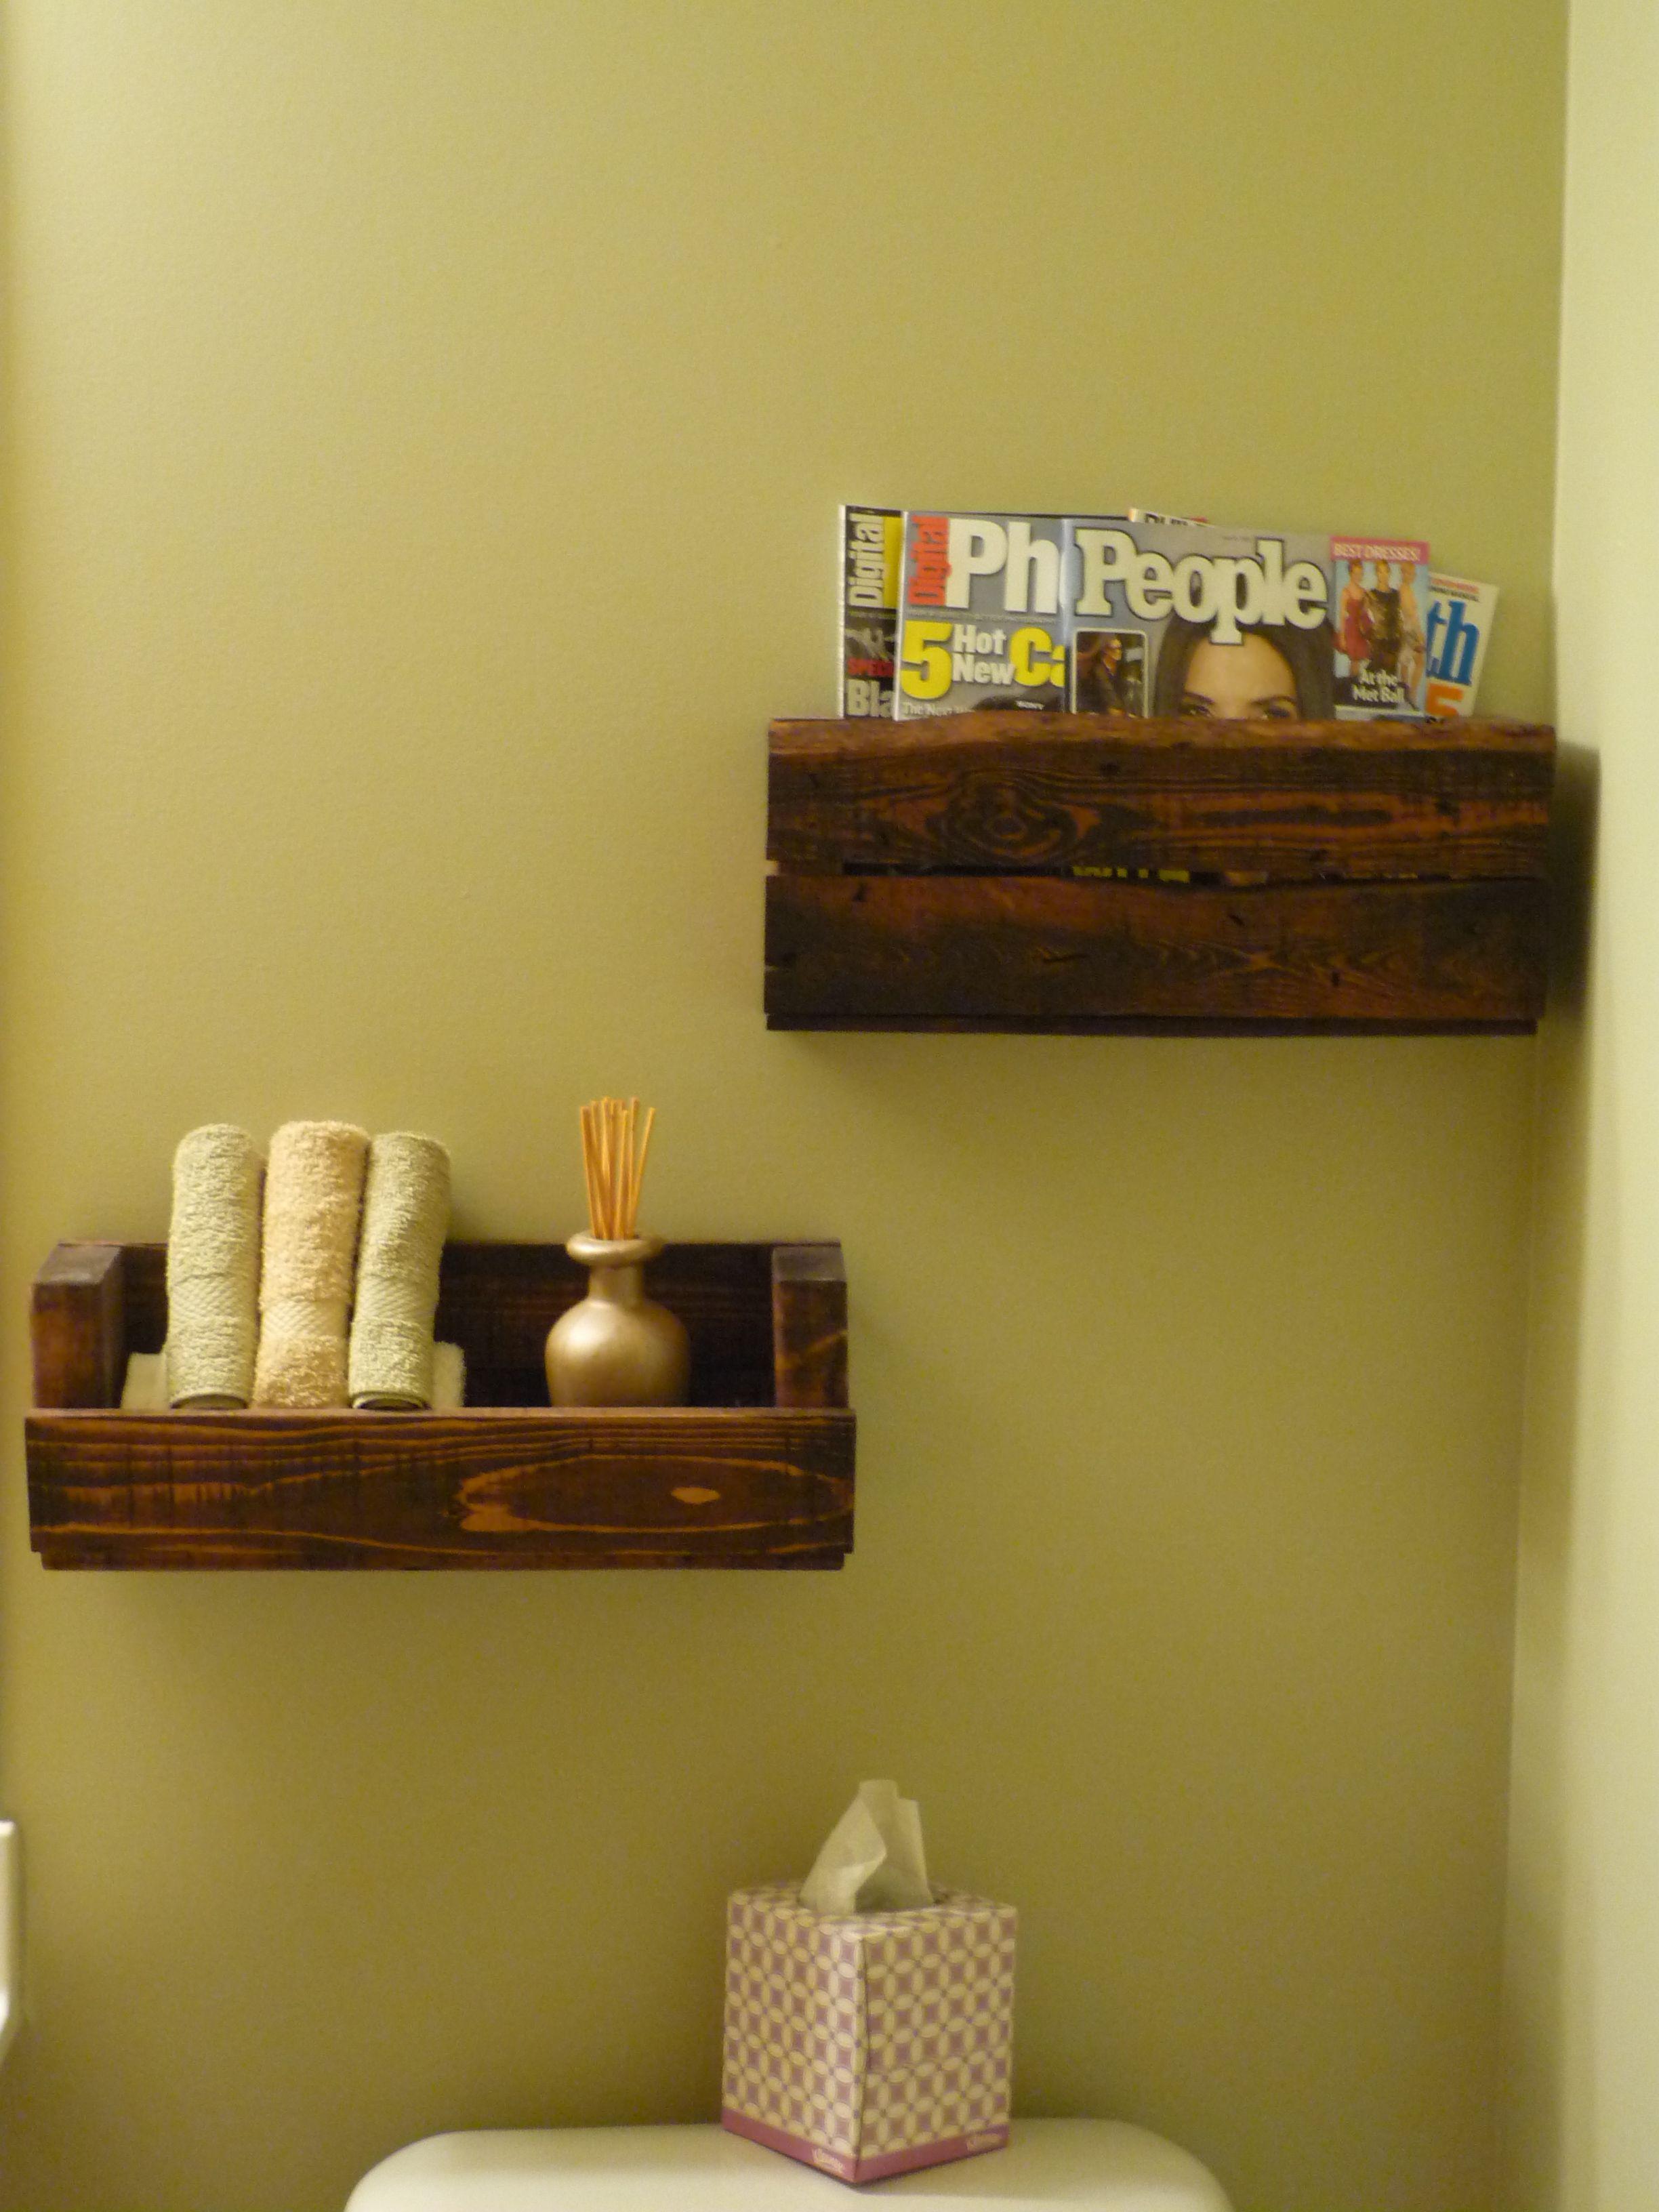 Repurposed Pallet into Wall Shelves #FoxValleyHabitat #Naperville ...